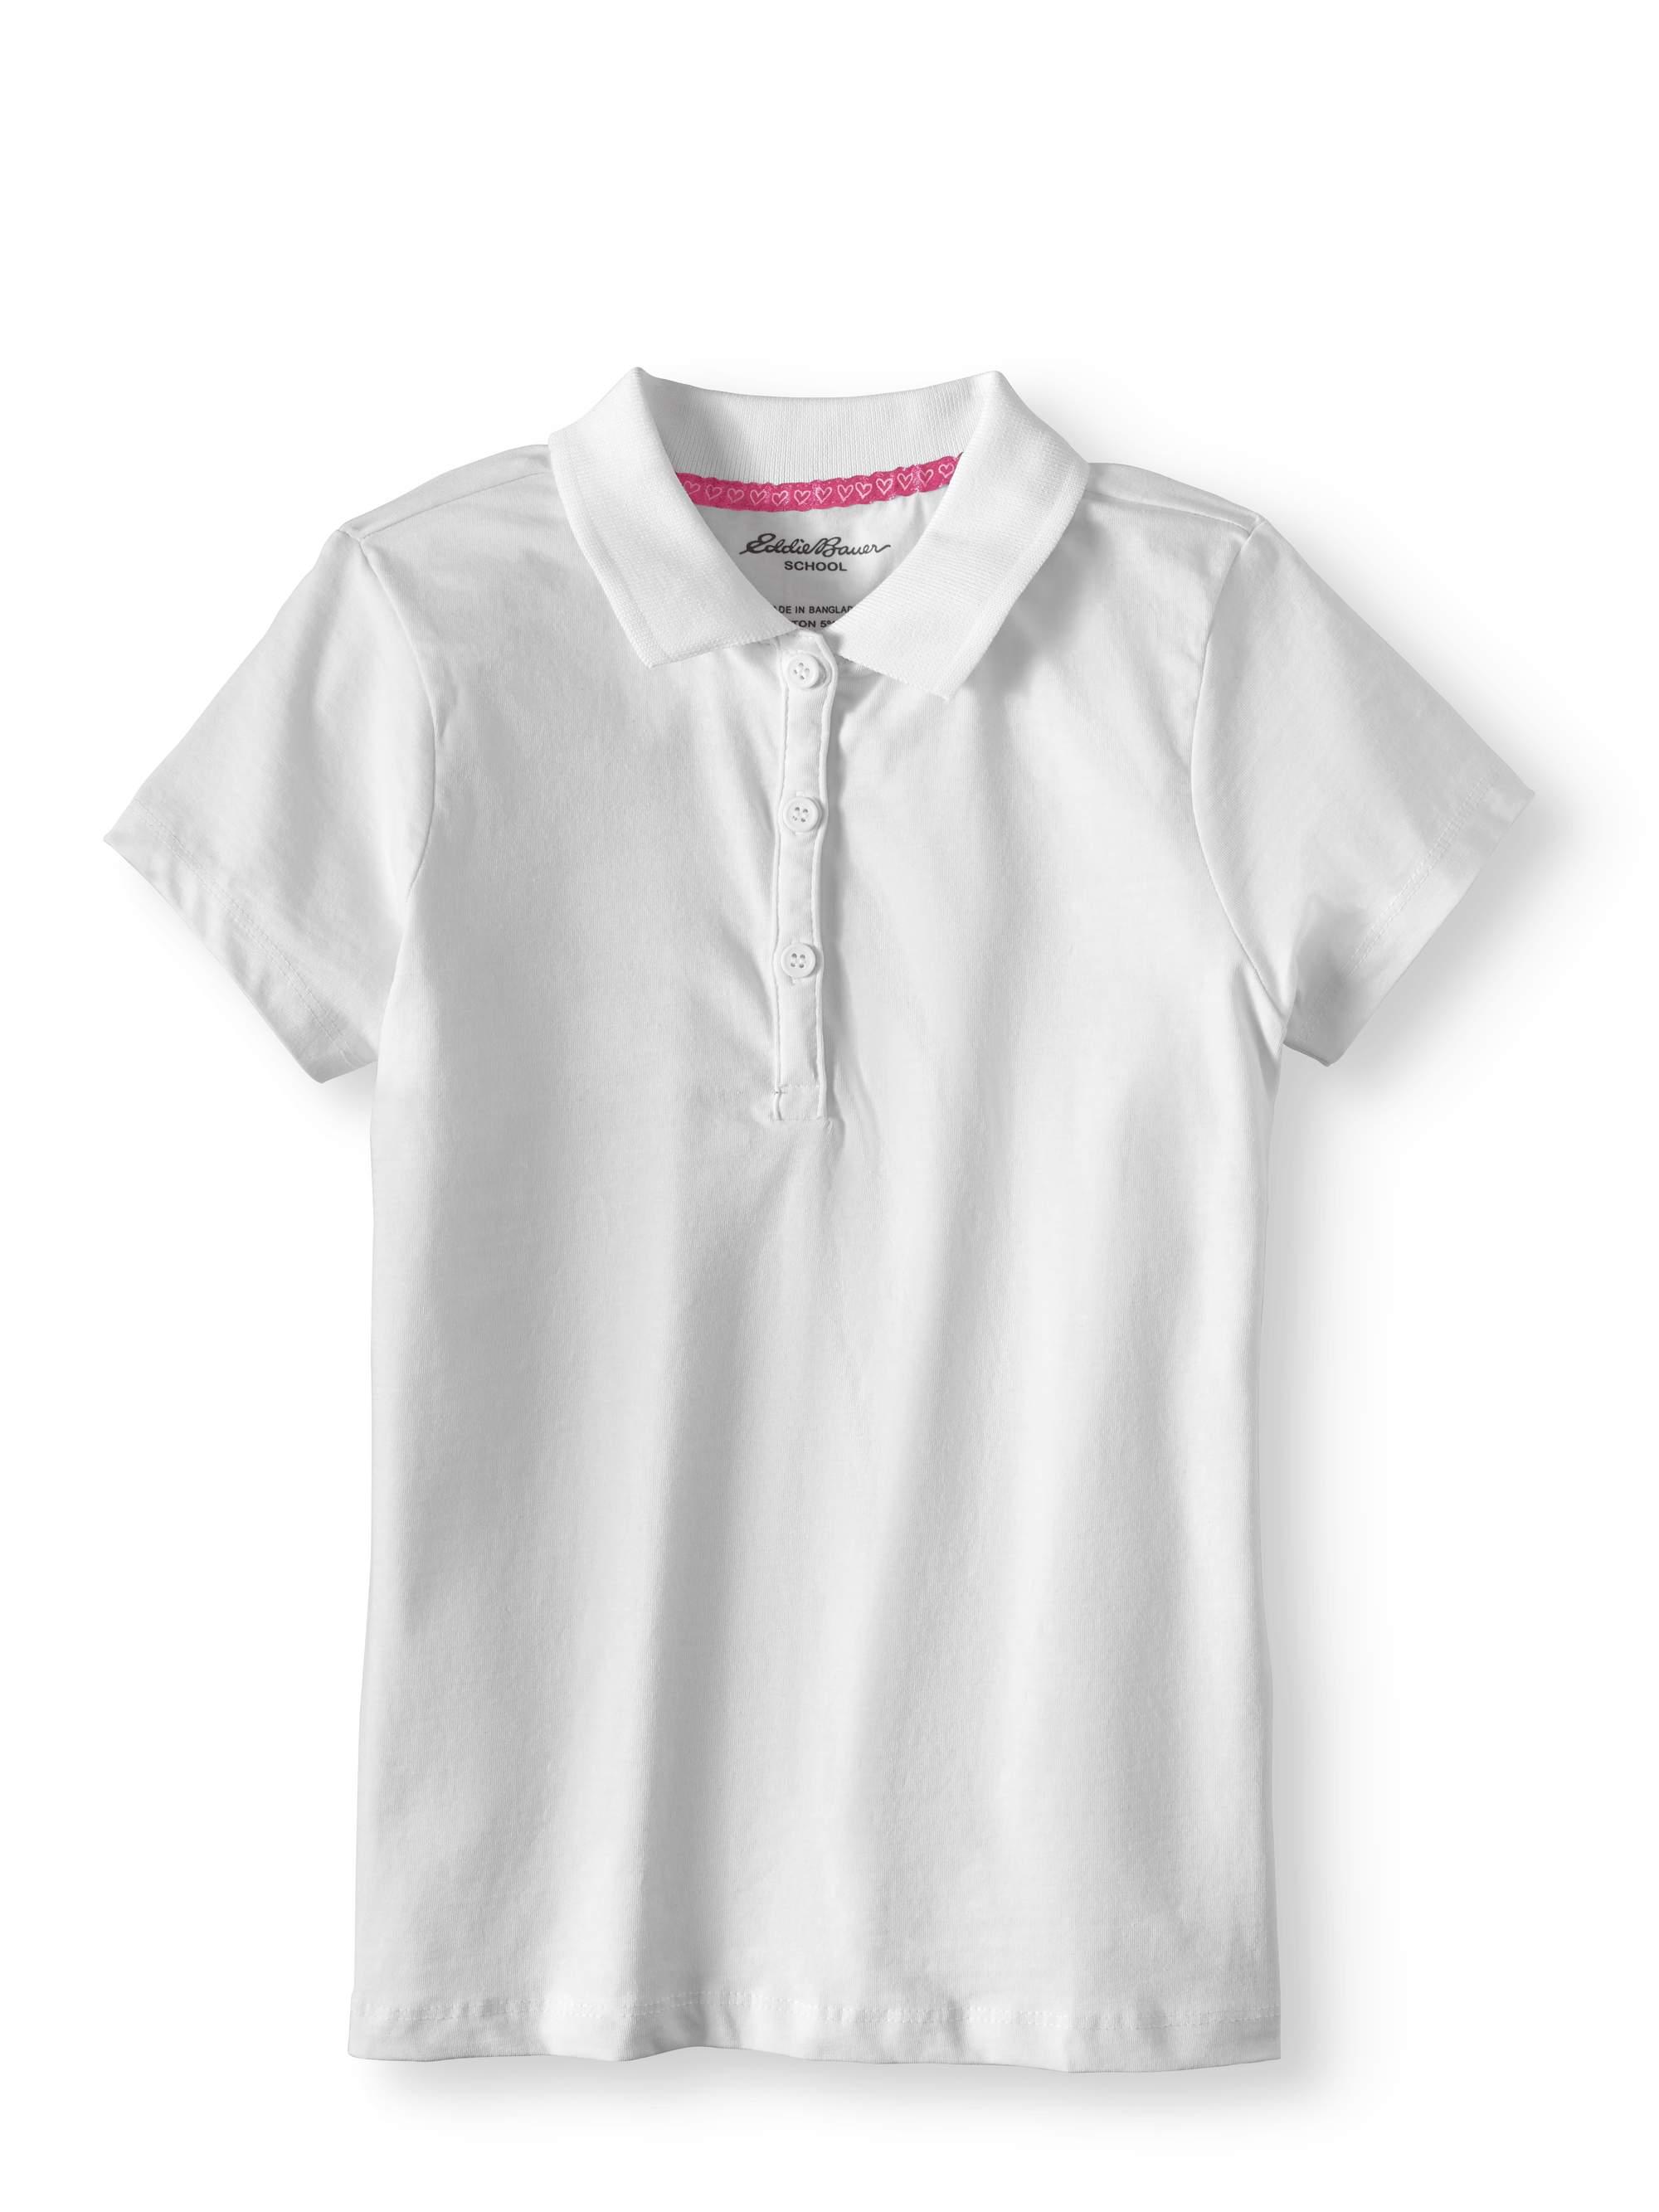 Girls School Uniform Short Sleeve Stretch Knit Polo Shirt